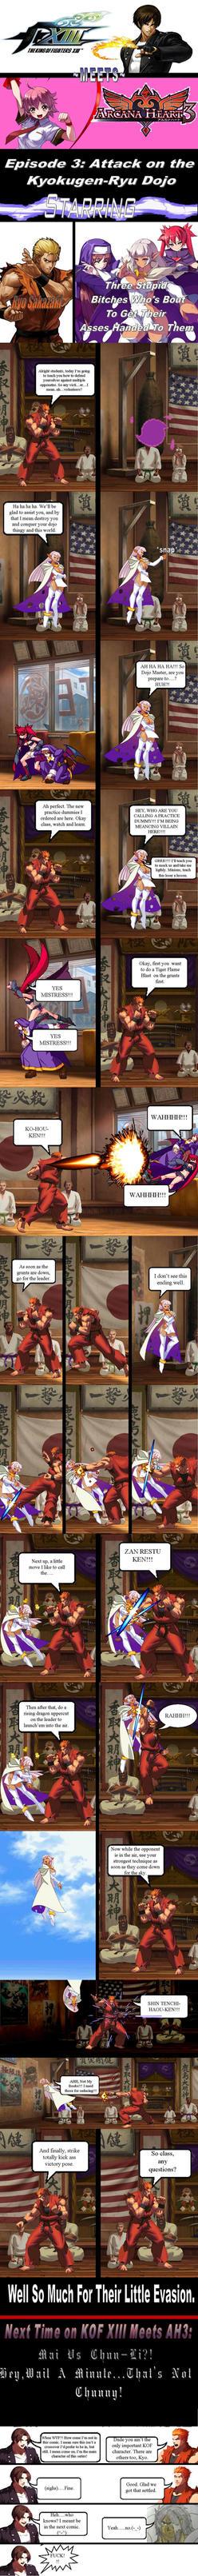 KOF XIII Meets Arcana Heart 3  Comic Issue #3 by ArtMaster09